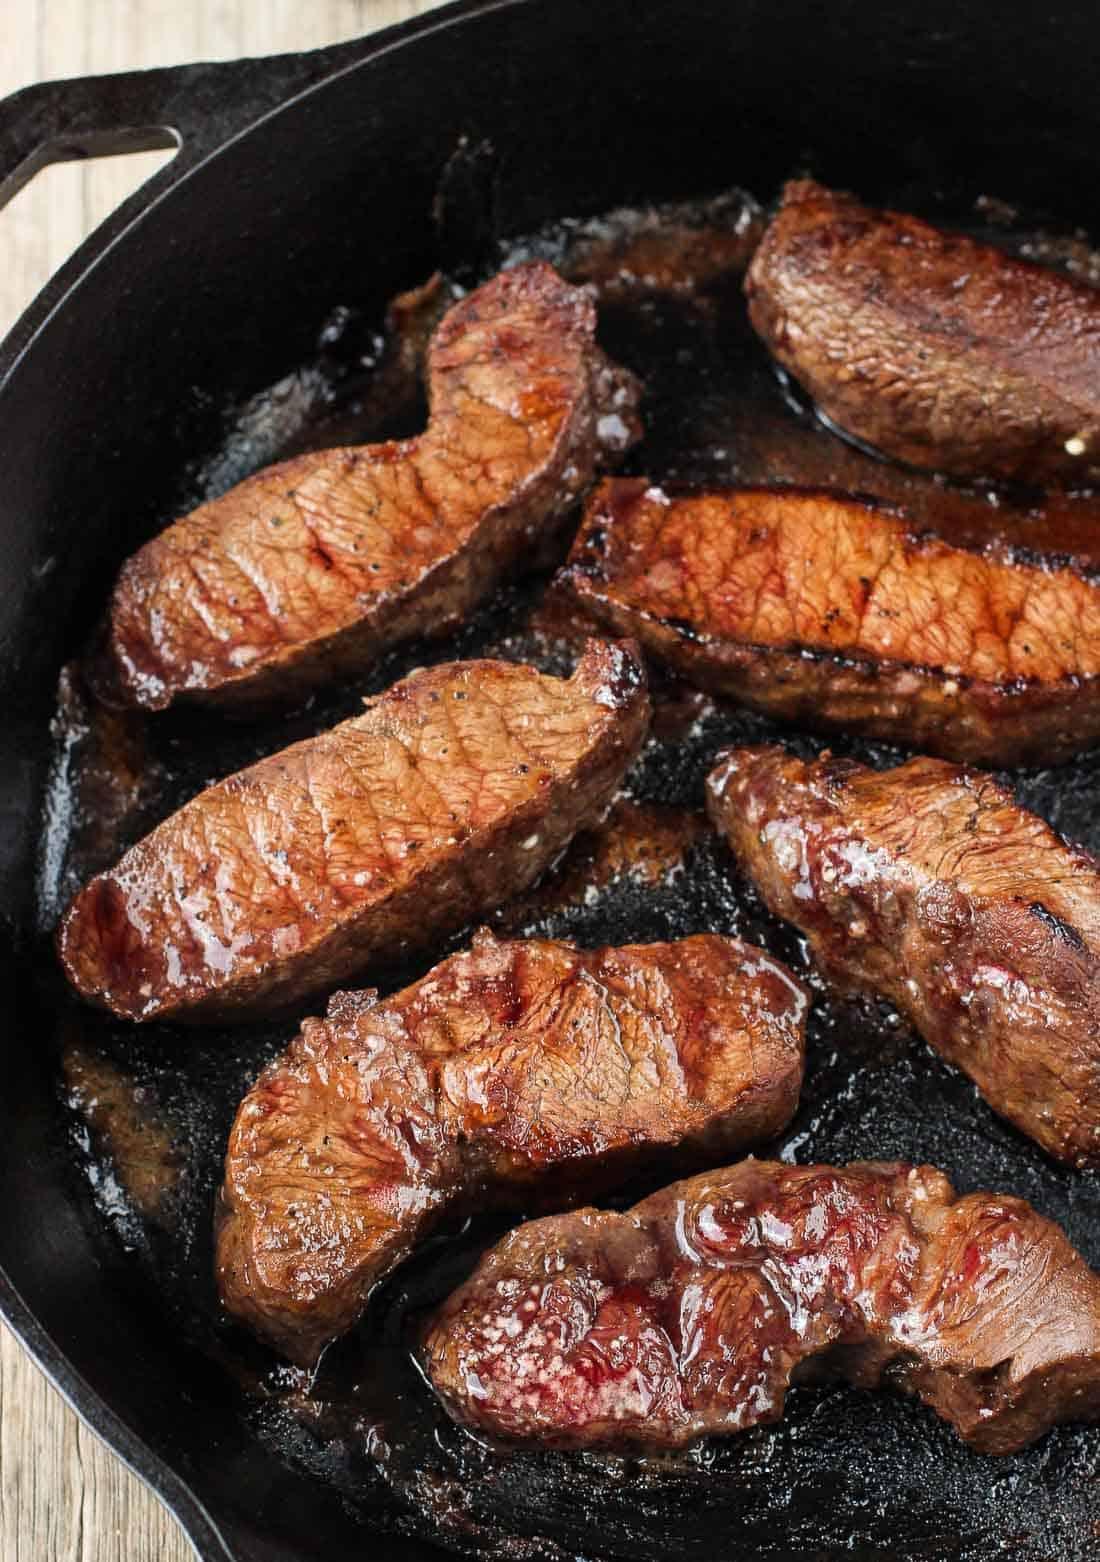 Balsamic Red Wine Flat Iron Steak